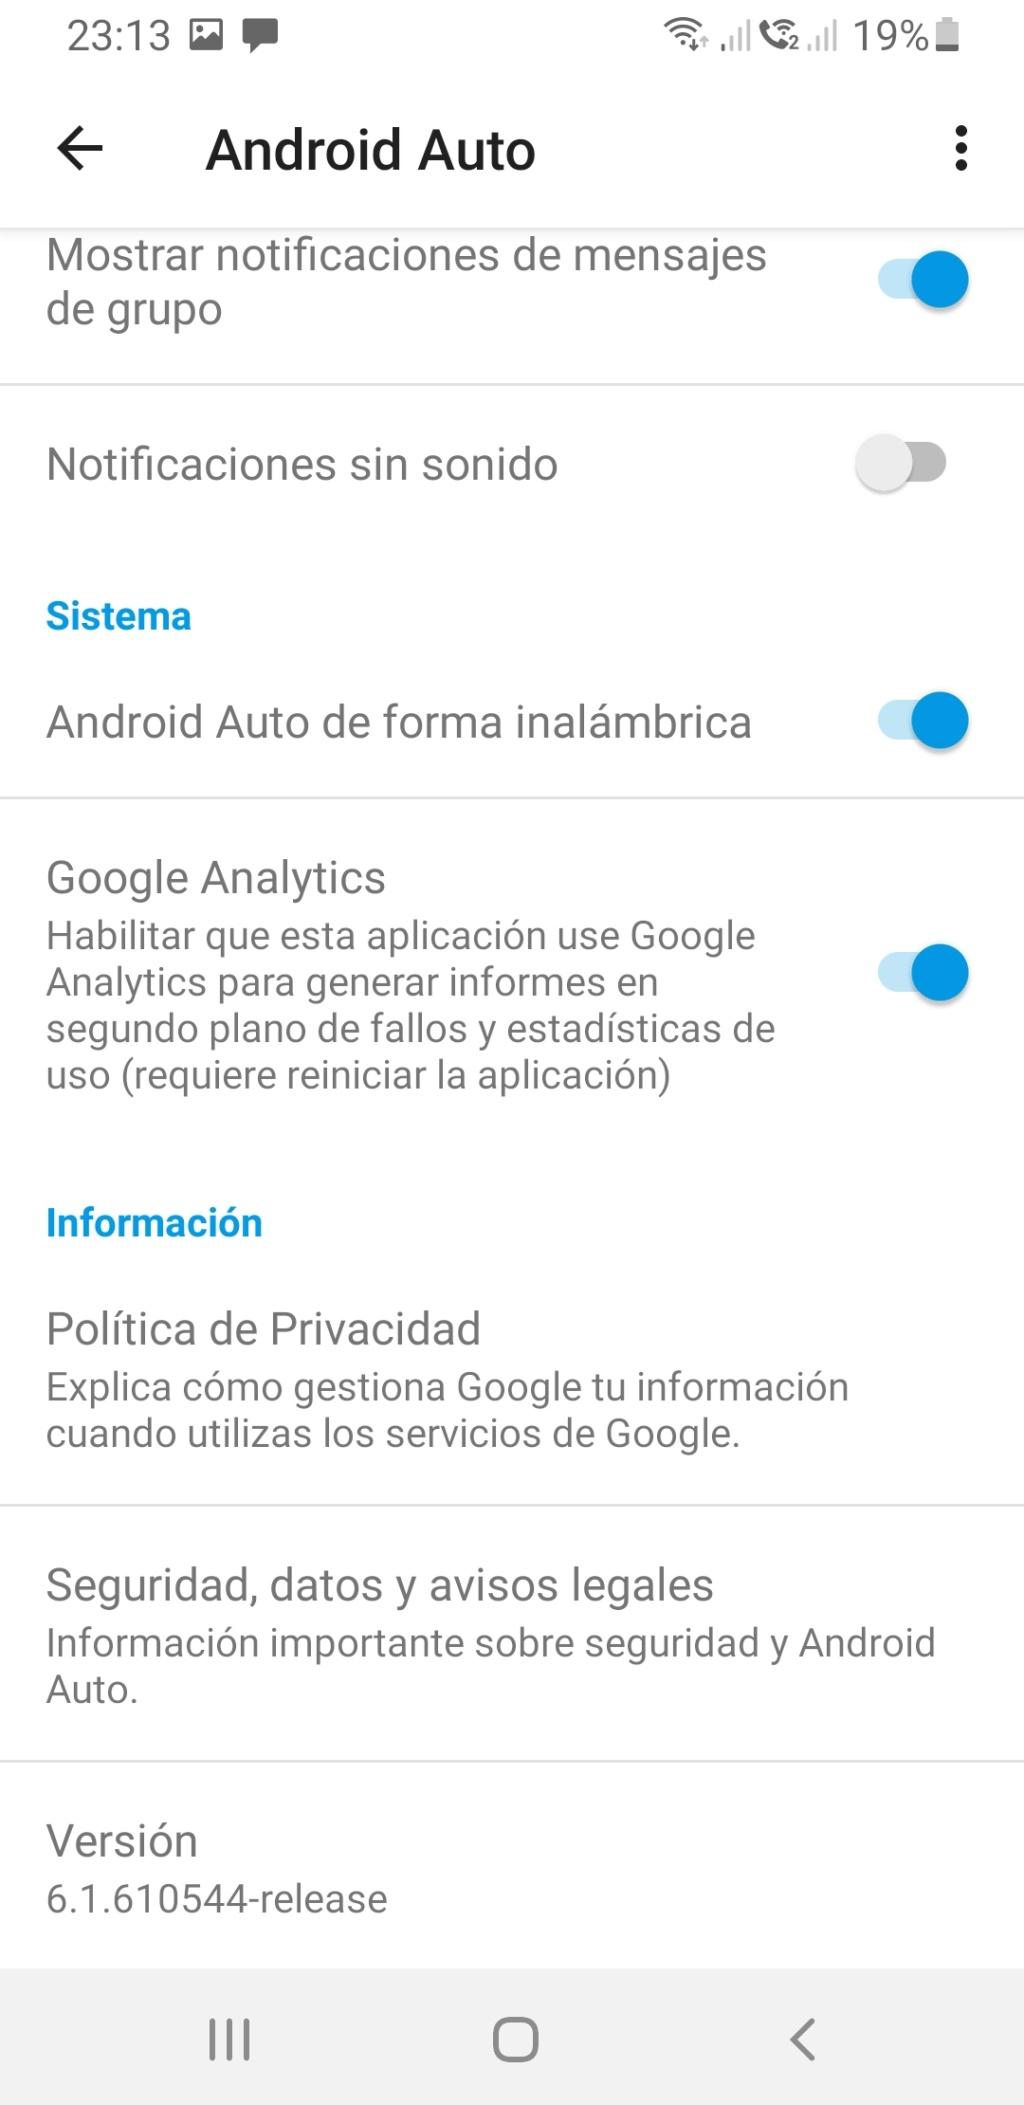 Android Auto inalambrico - Página 5 Screen15